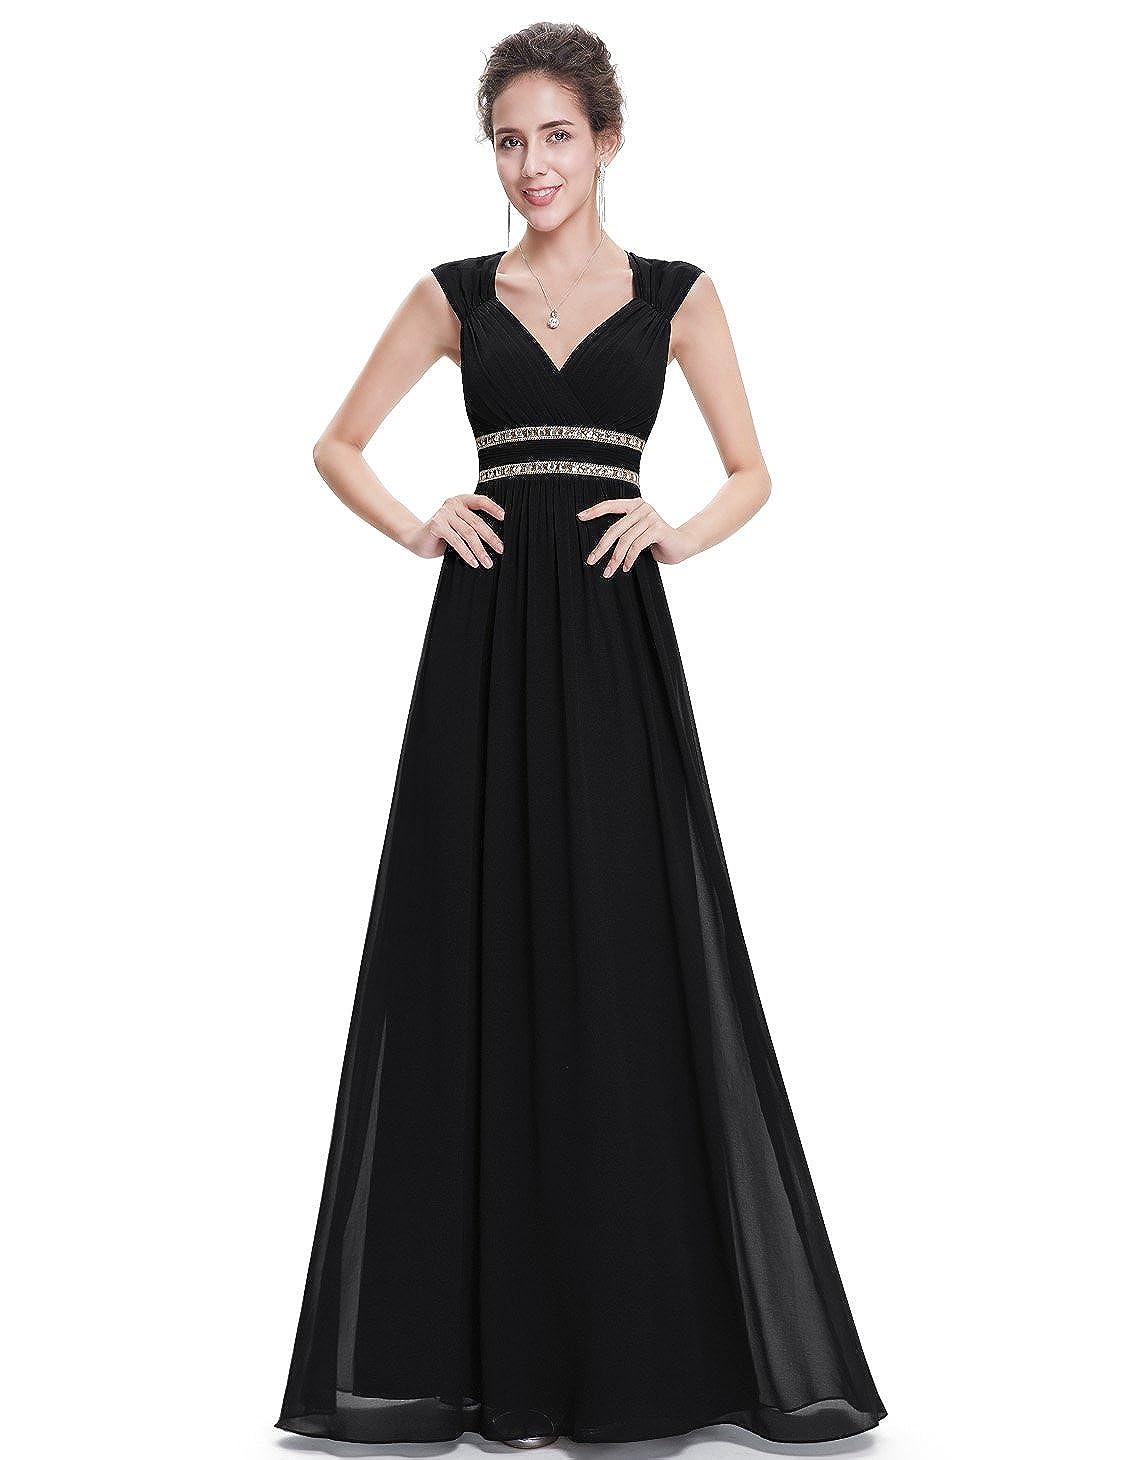 4ac96aa277b Ever-Pretty Women's Elegant V-Neck Sleeveless Formal Long Evening Dress  08697 at Amazon Women's Clothing store: